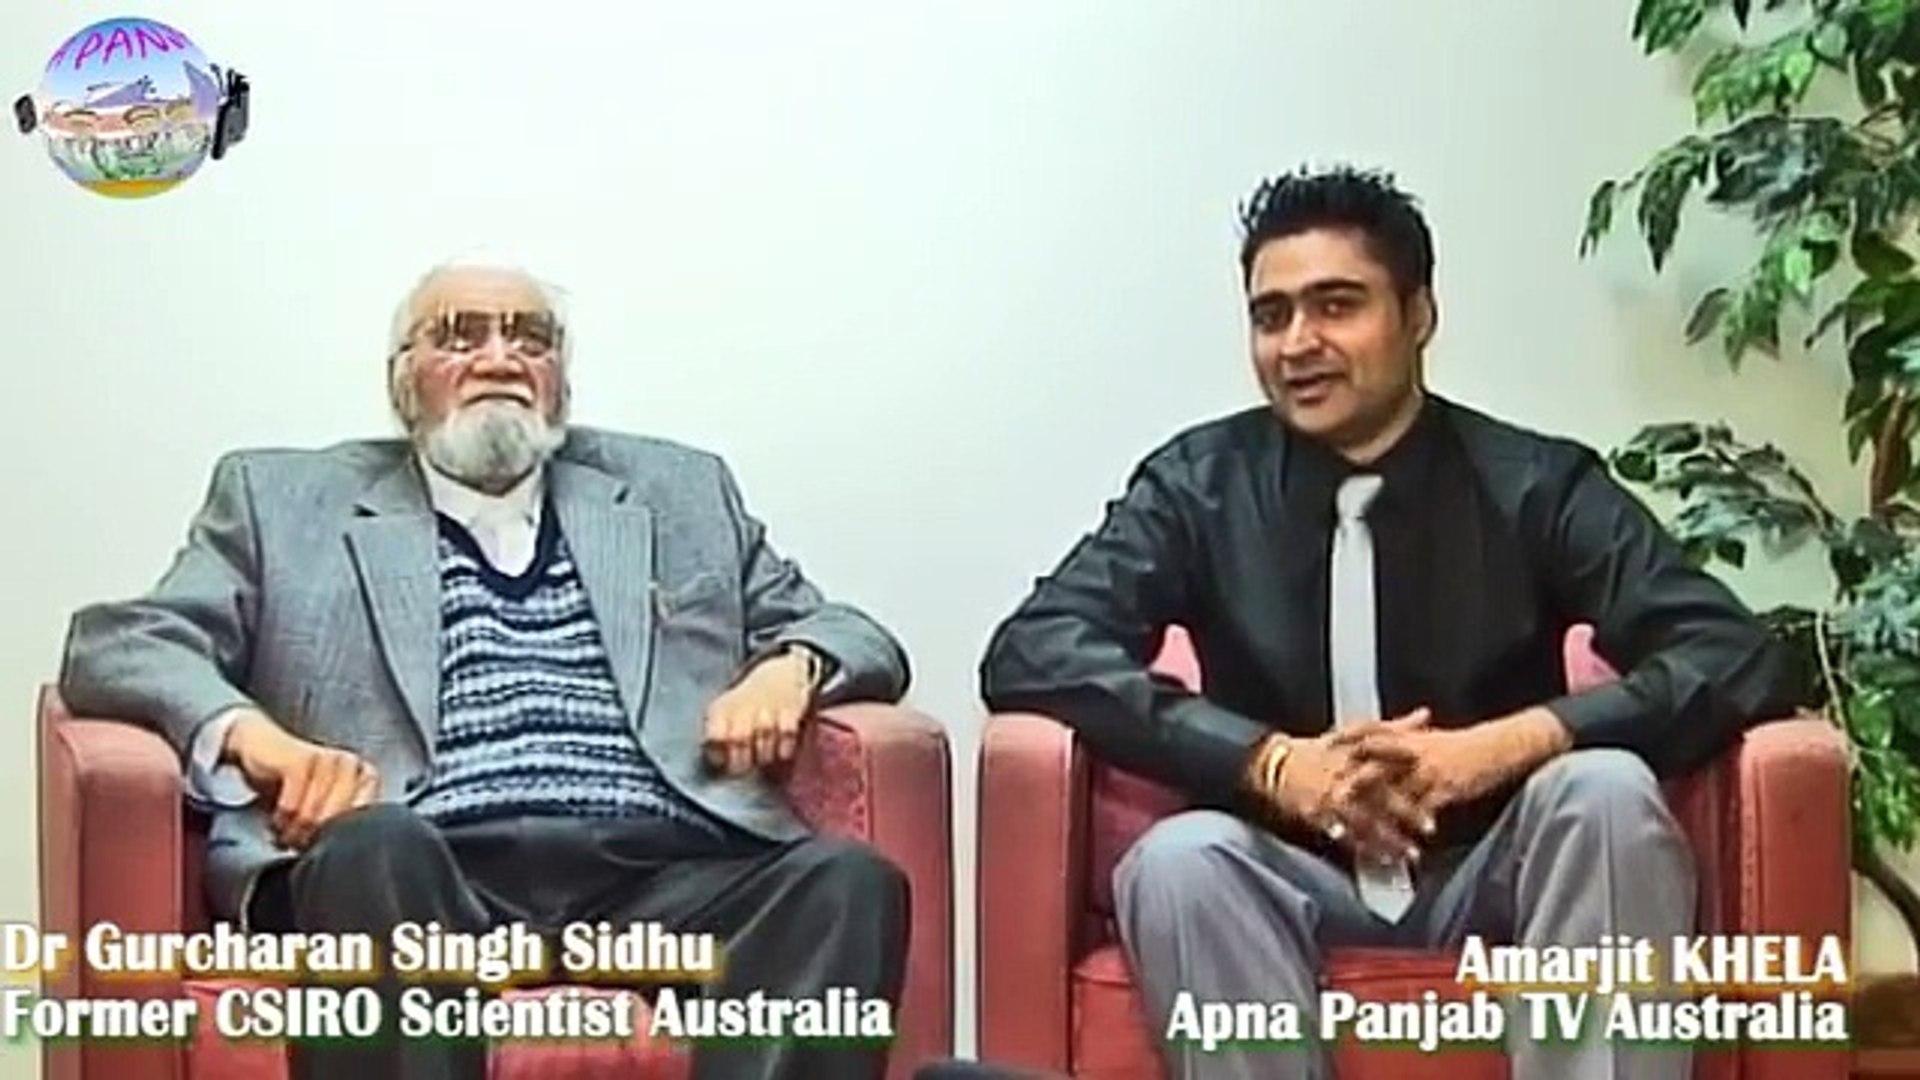 Dr  Gurcharan Sidhu sharing memories of 1947 India Pak partition with Apna Panjab TV